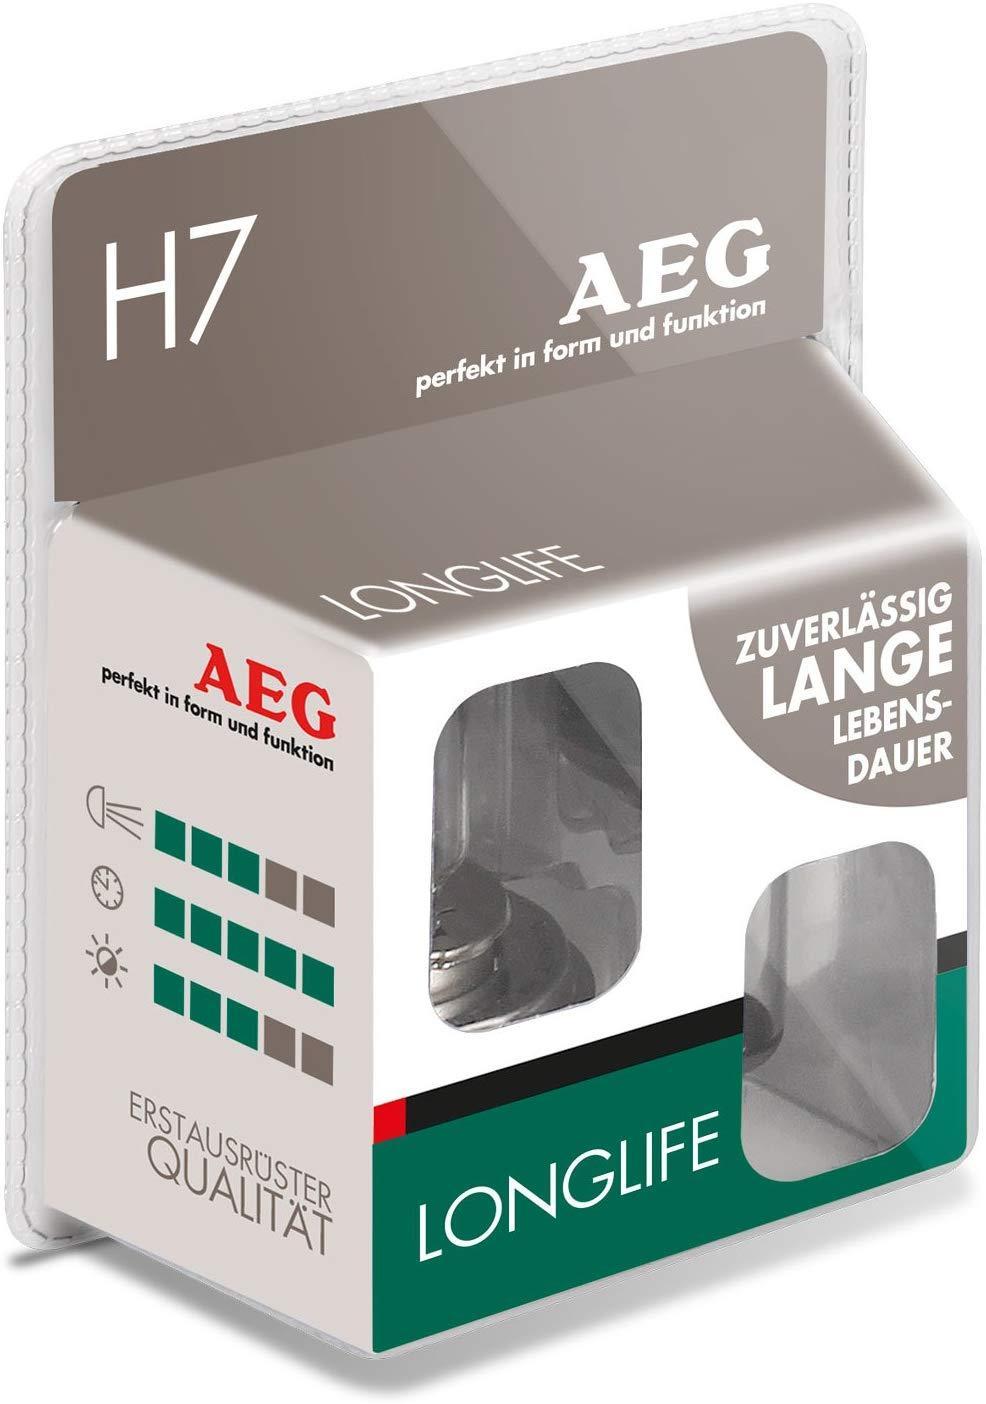 97266 AEG LONGLIFE H7 12V 55W Glühlampe, Fernscheinwerfer 97266 günstig kaufen